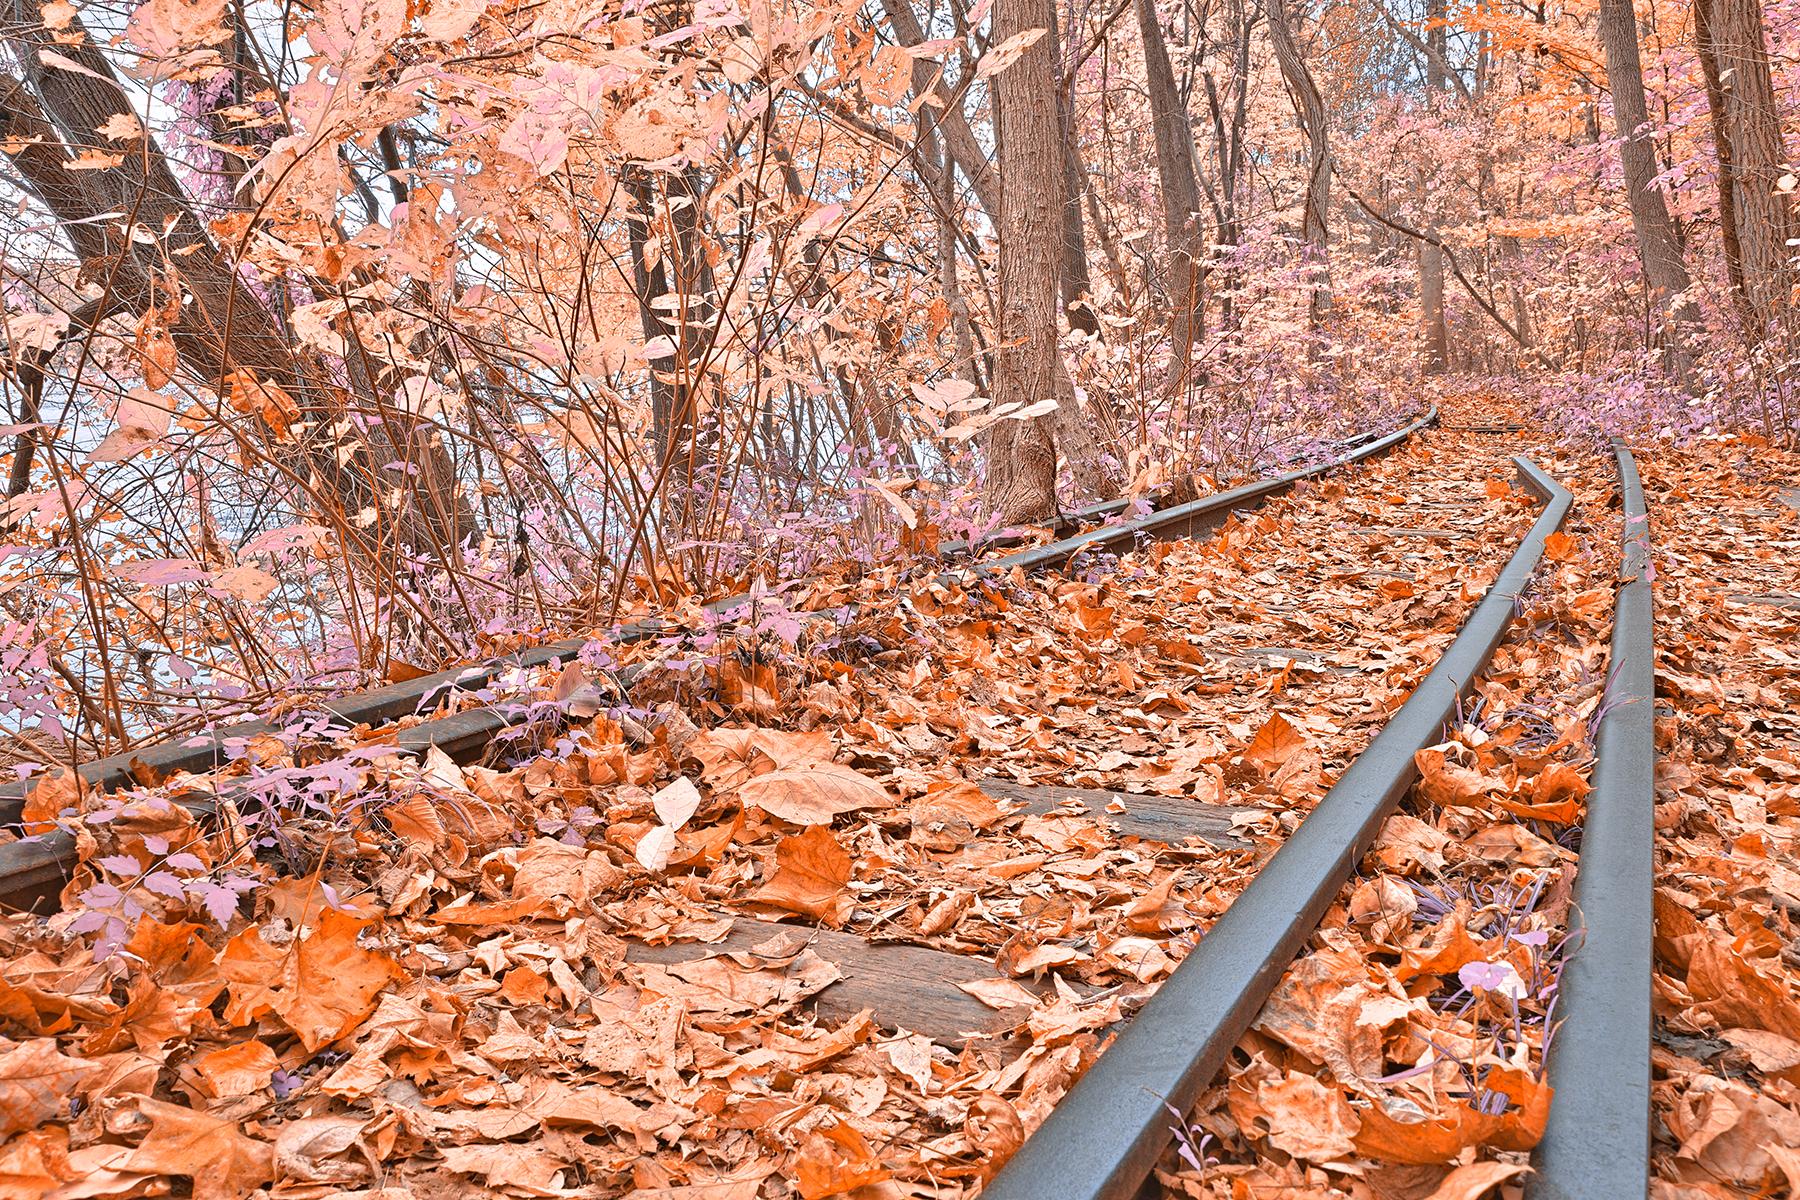 Abandoned susquehanna railroad - fantasy express hdr photo